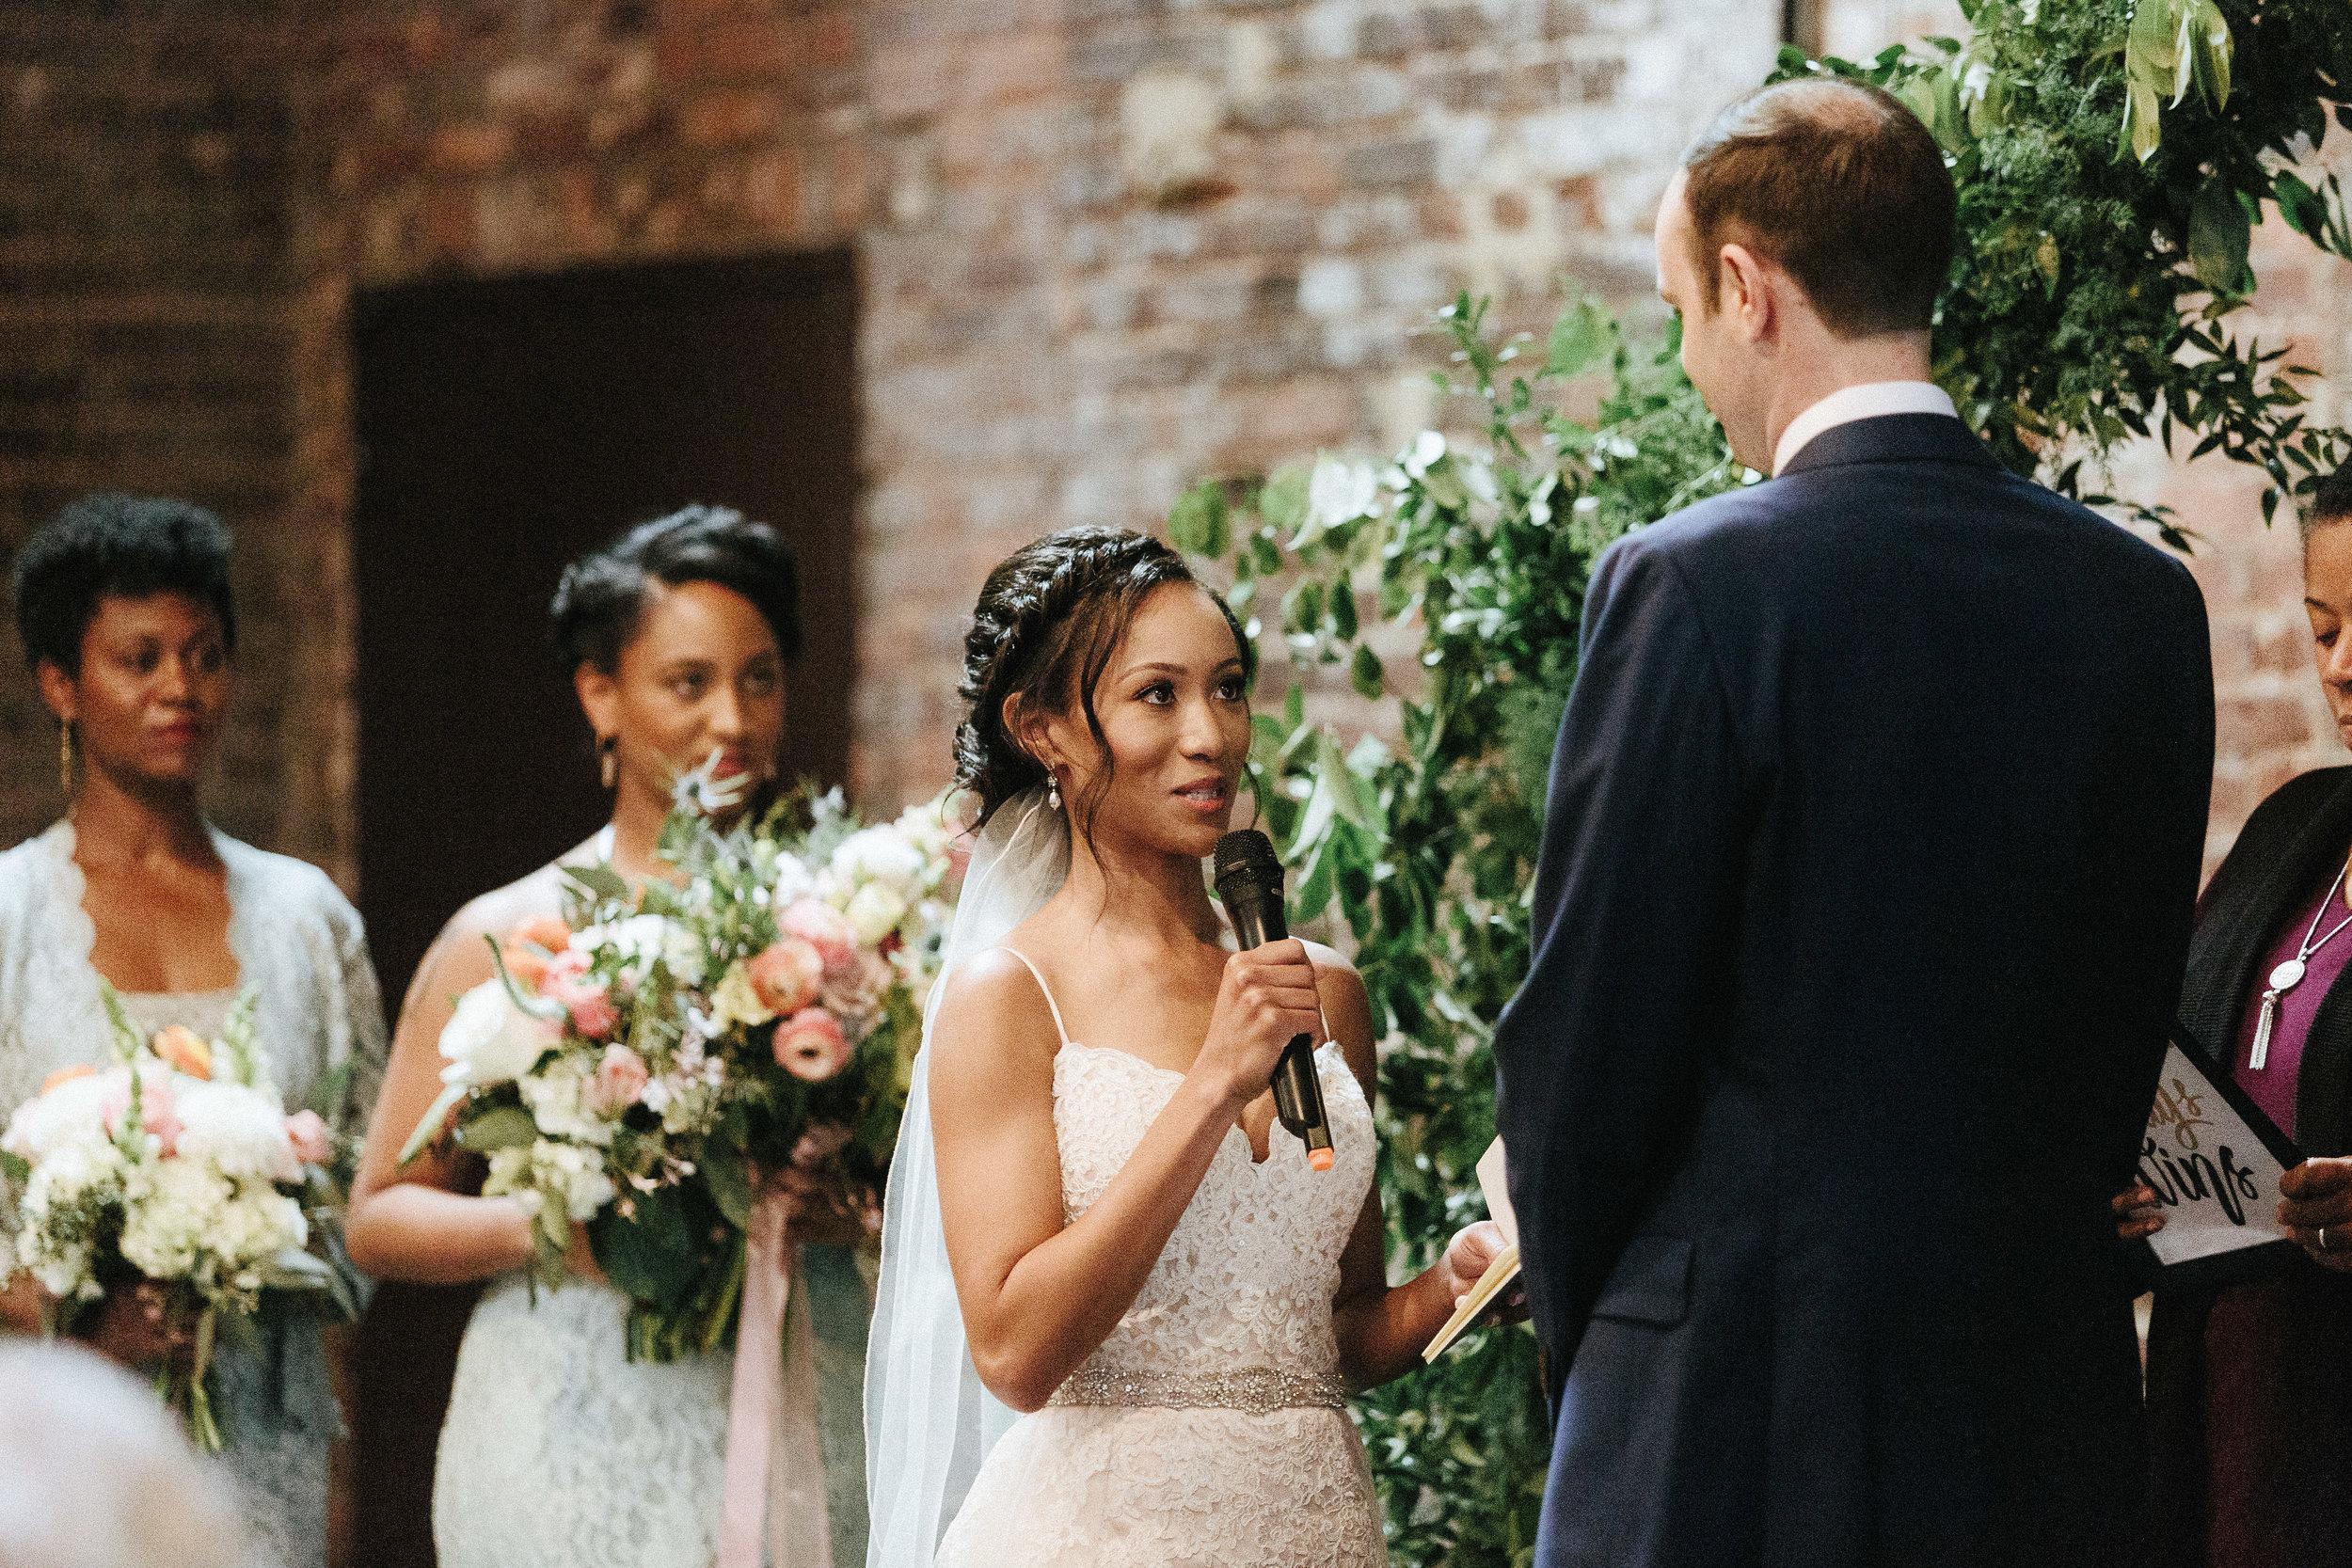 king_plow_atlanta_wedding_art_gallery_modern_lifestyle_documentary_1507.jpg